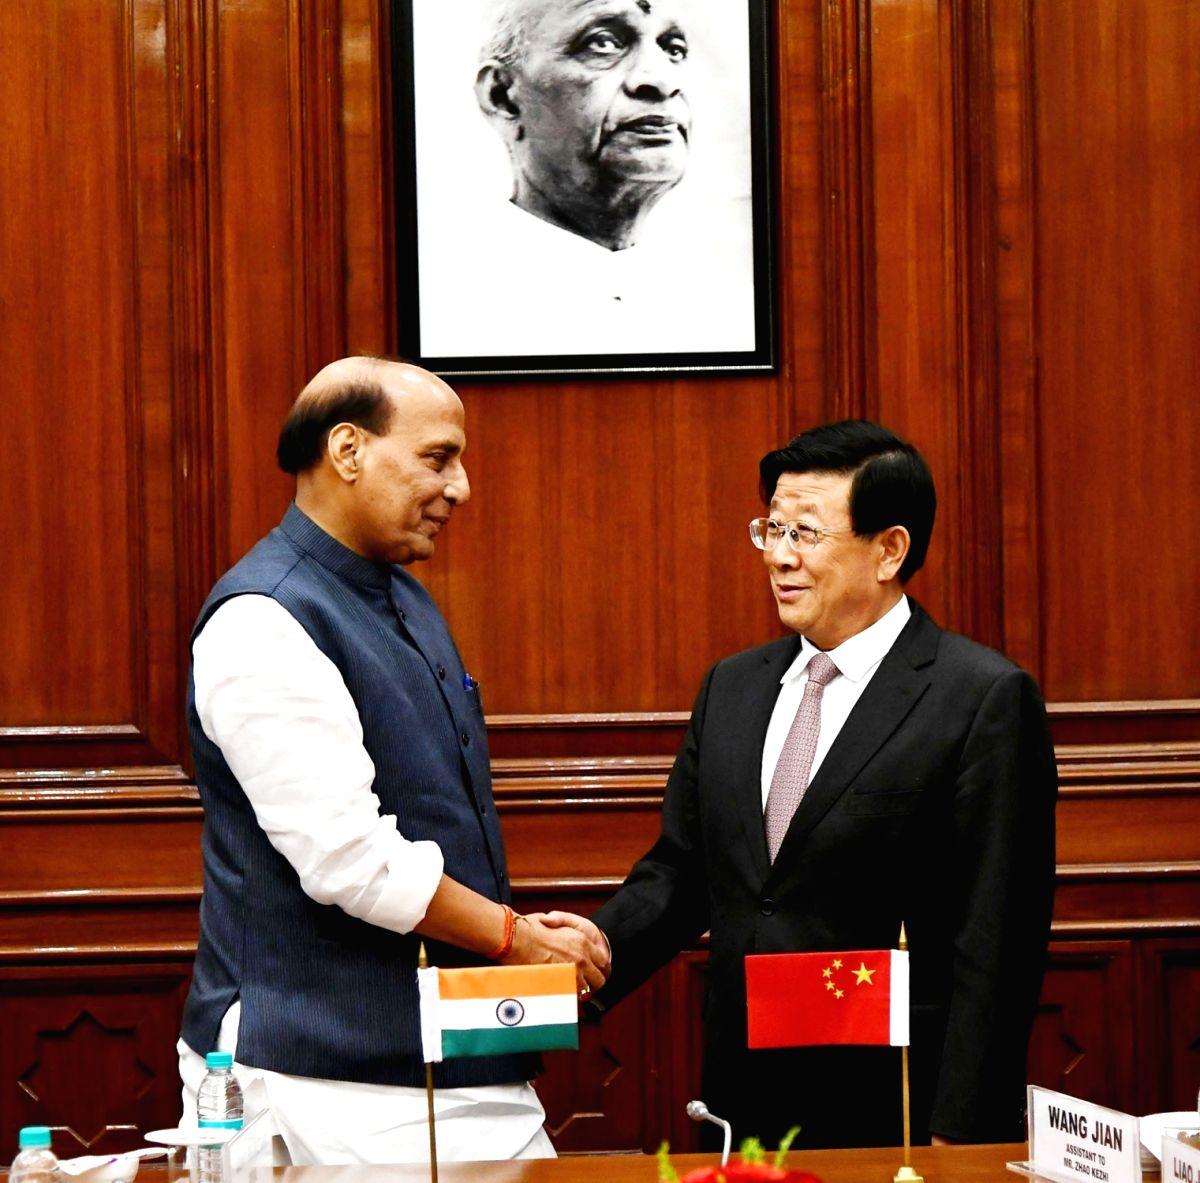 :New Delhi: Union Home Minister Rajnath Singh meets China's Public Security Minister Zhao Kezhi in New Delhi, on Oct 22, 2018. (Photo: IANS/PIB).